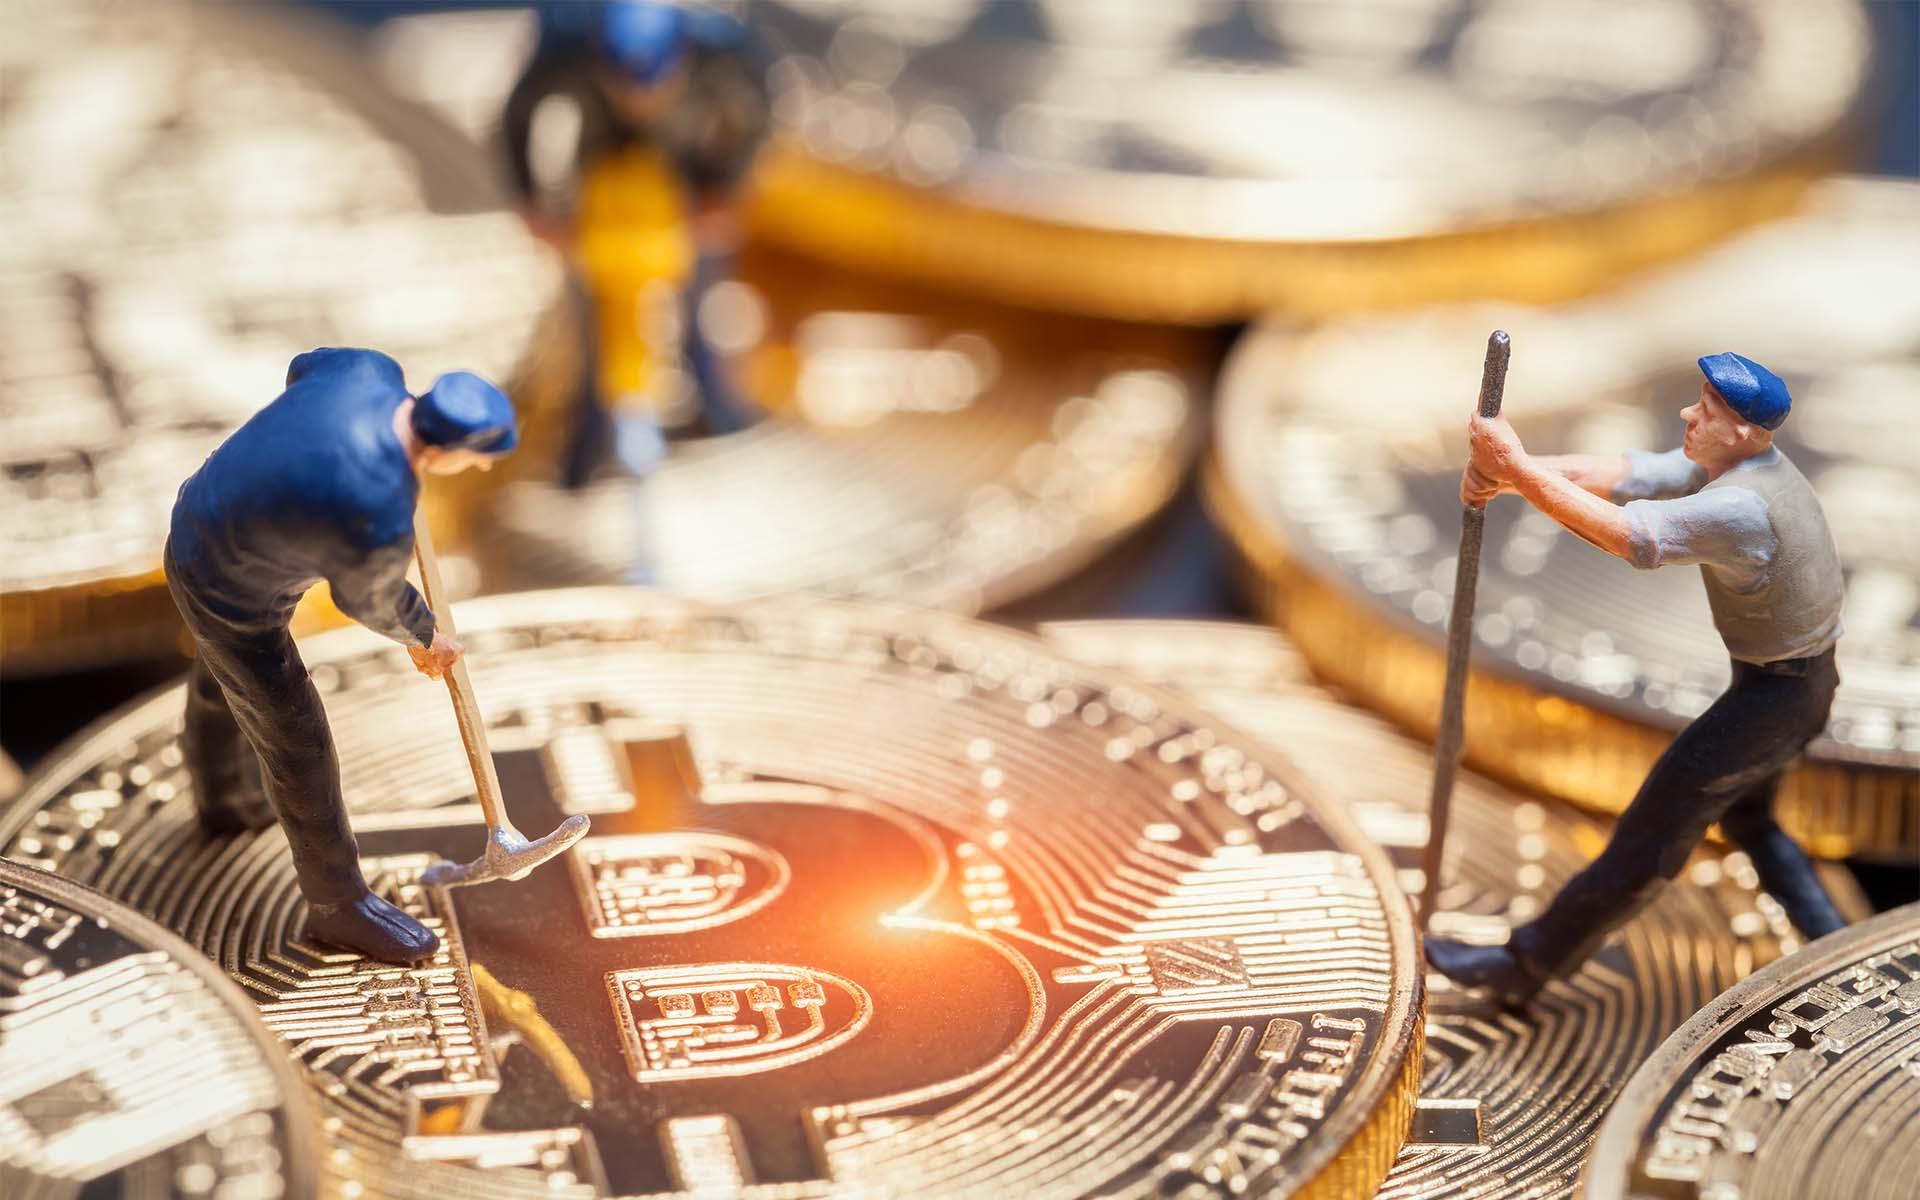 The Scourge of Cryptojacking